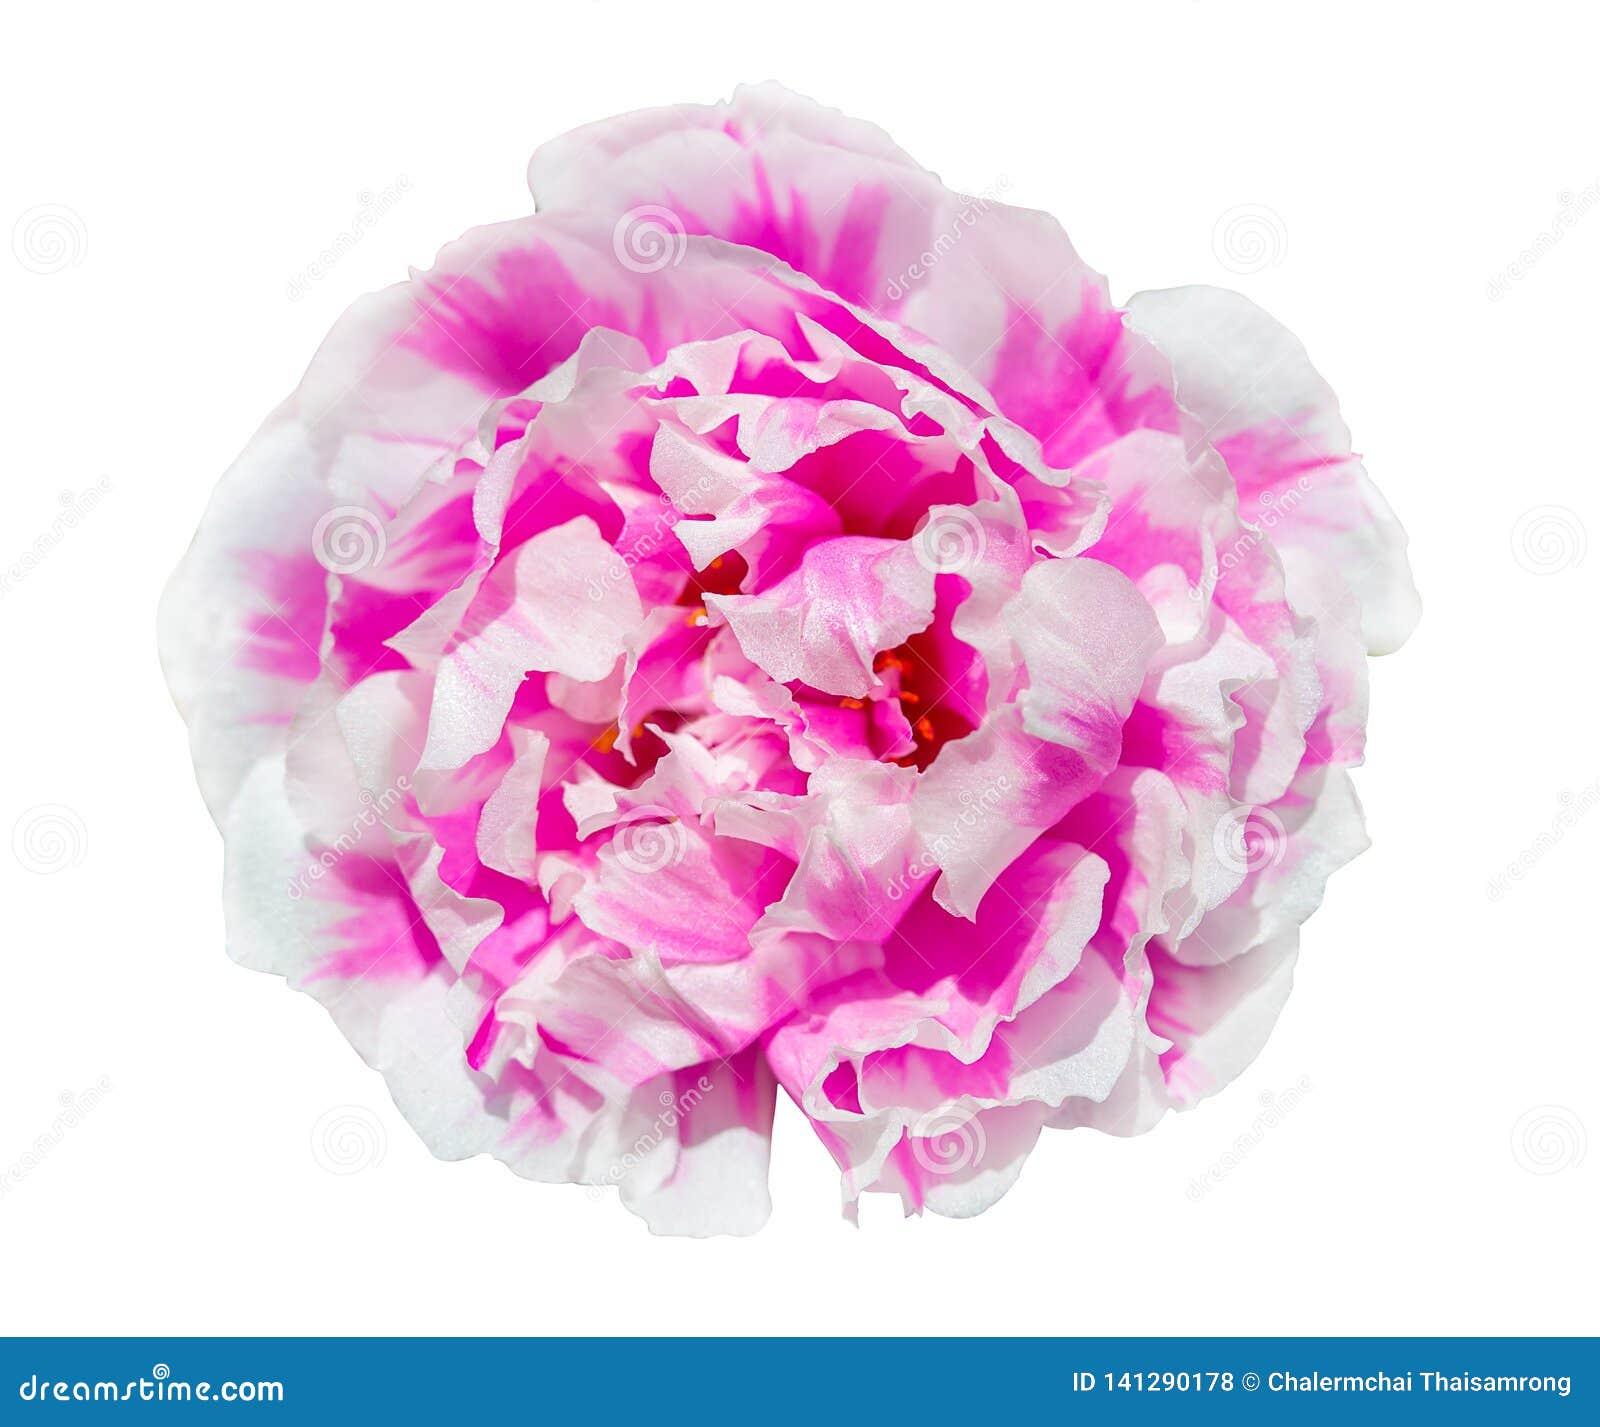 Flor de Portulaca isolada no fundo branco com trajeto de grampeamento